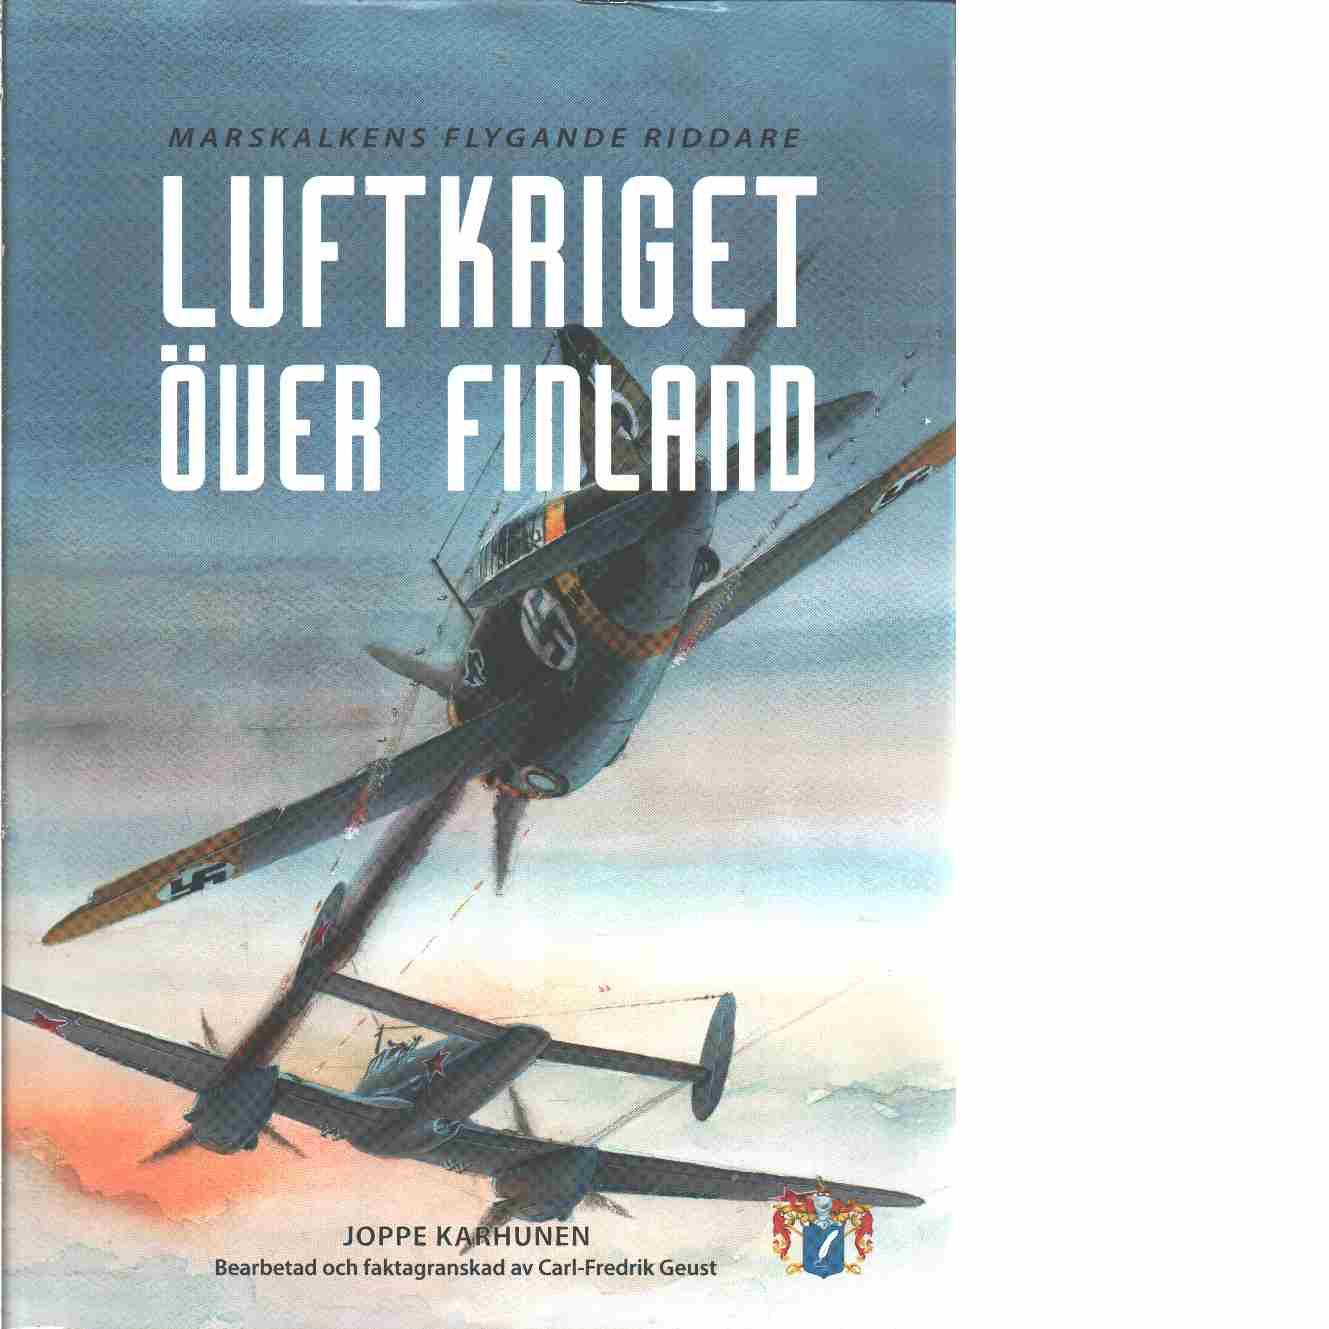 Luftkriget över Finland : marskalkens flygande riddare - Karhunen, Joppe